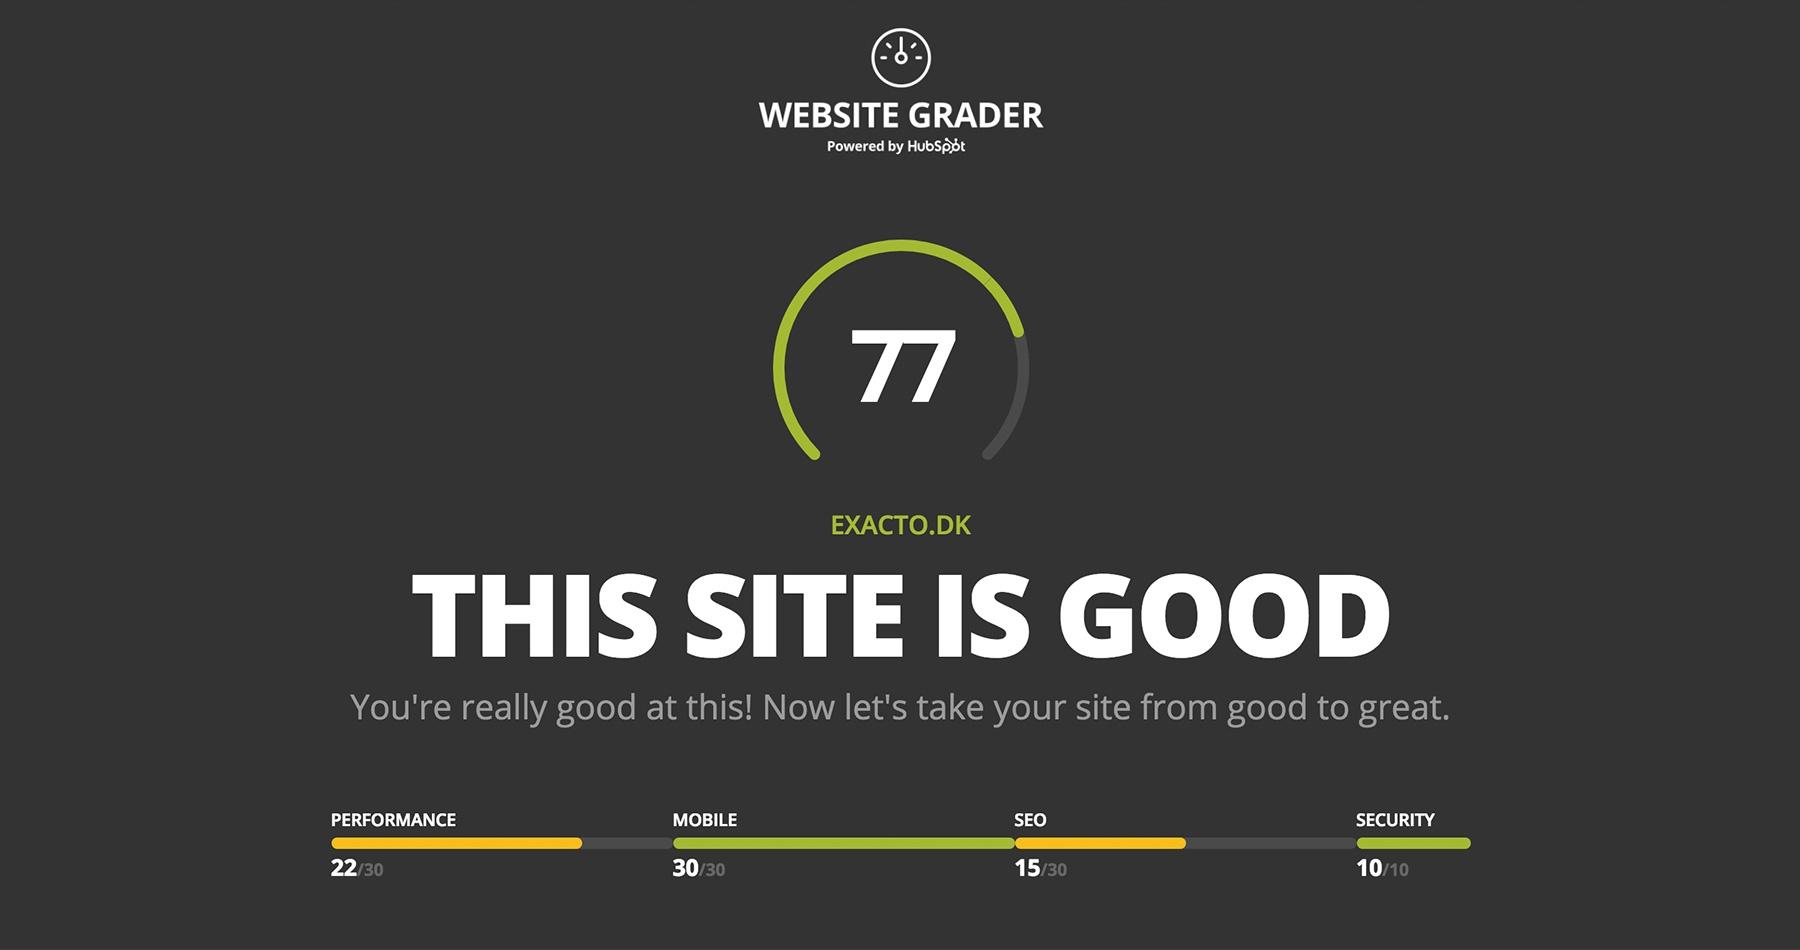 Website_Grader-1800x950px-01